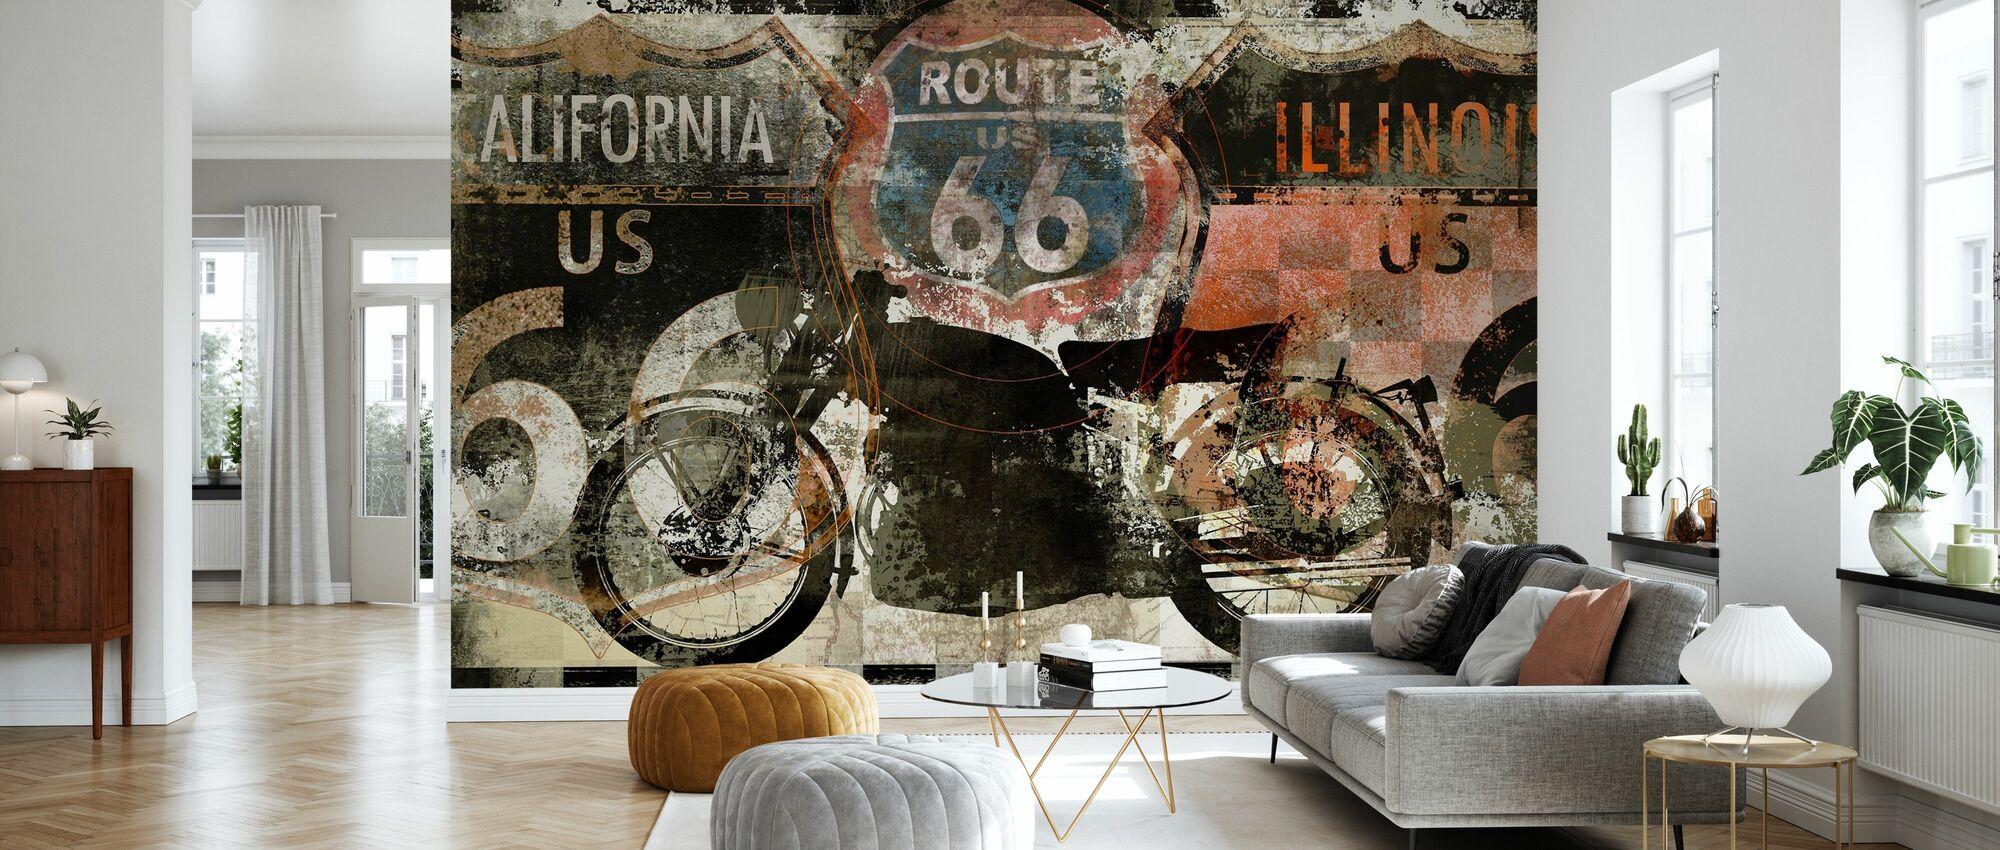 Route 66 US - Wallpaper - Living Room